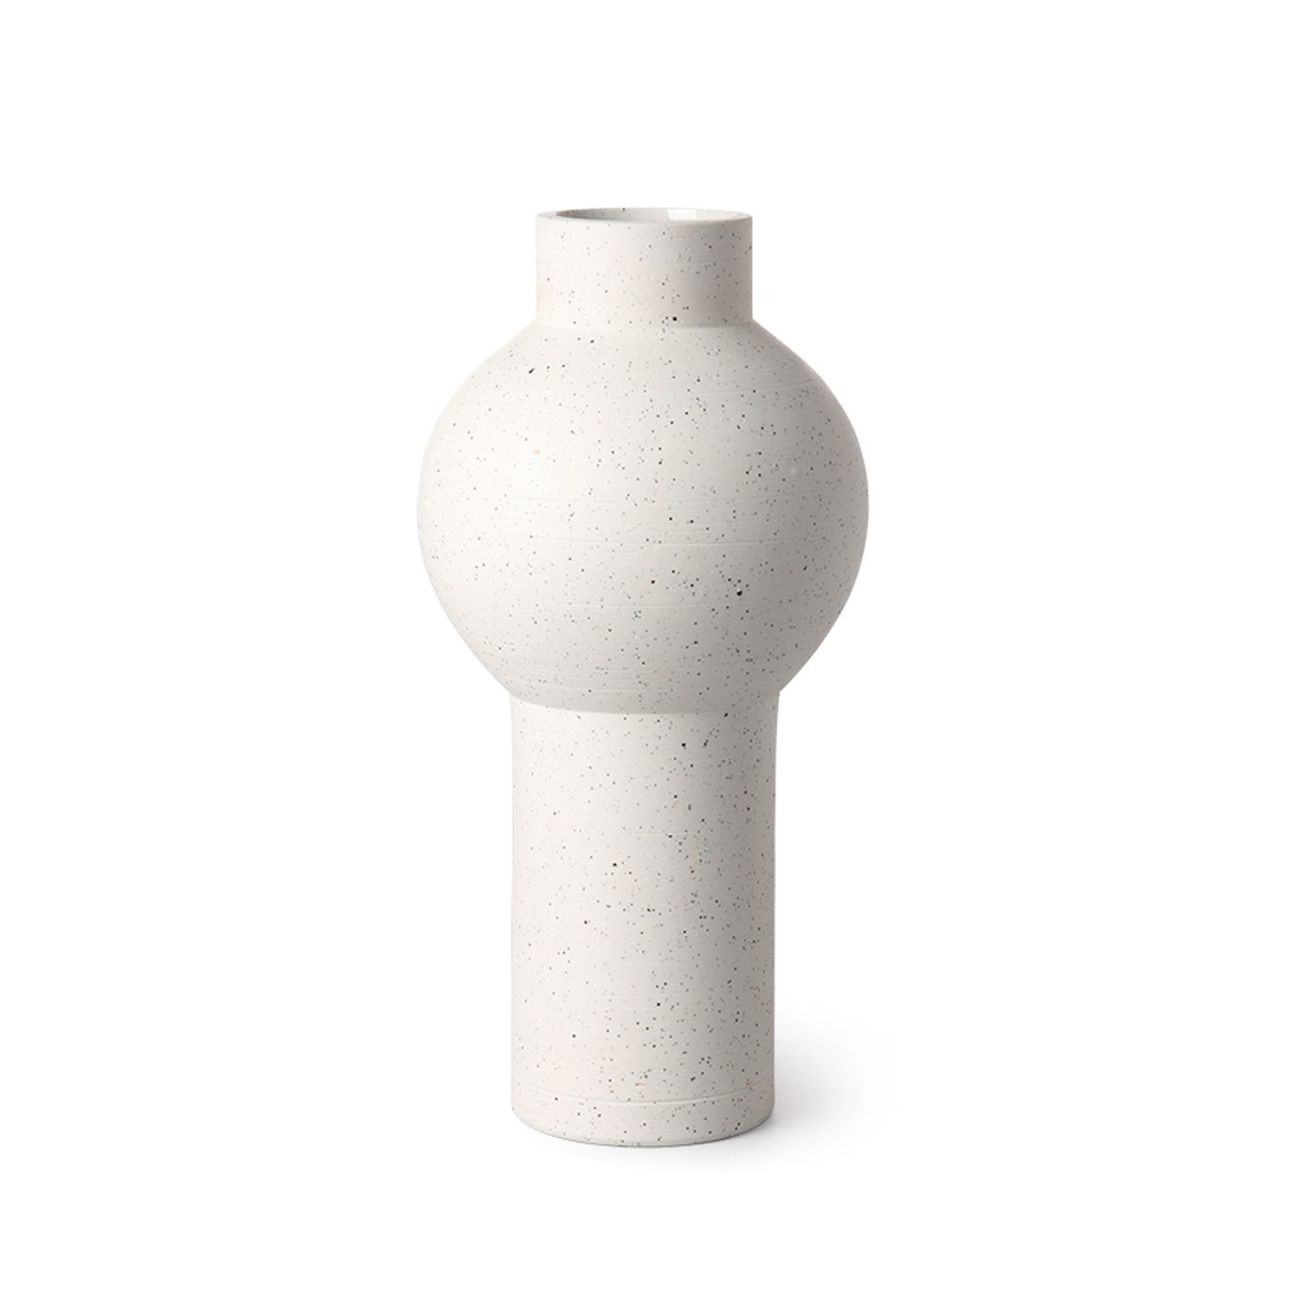 HK living speckled clay Vase round Blumenvase - M